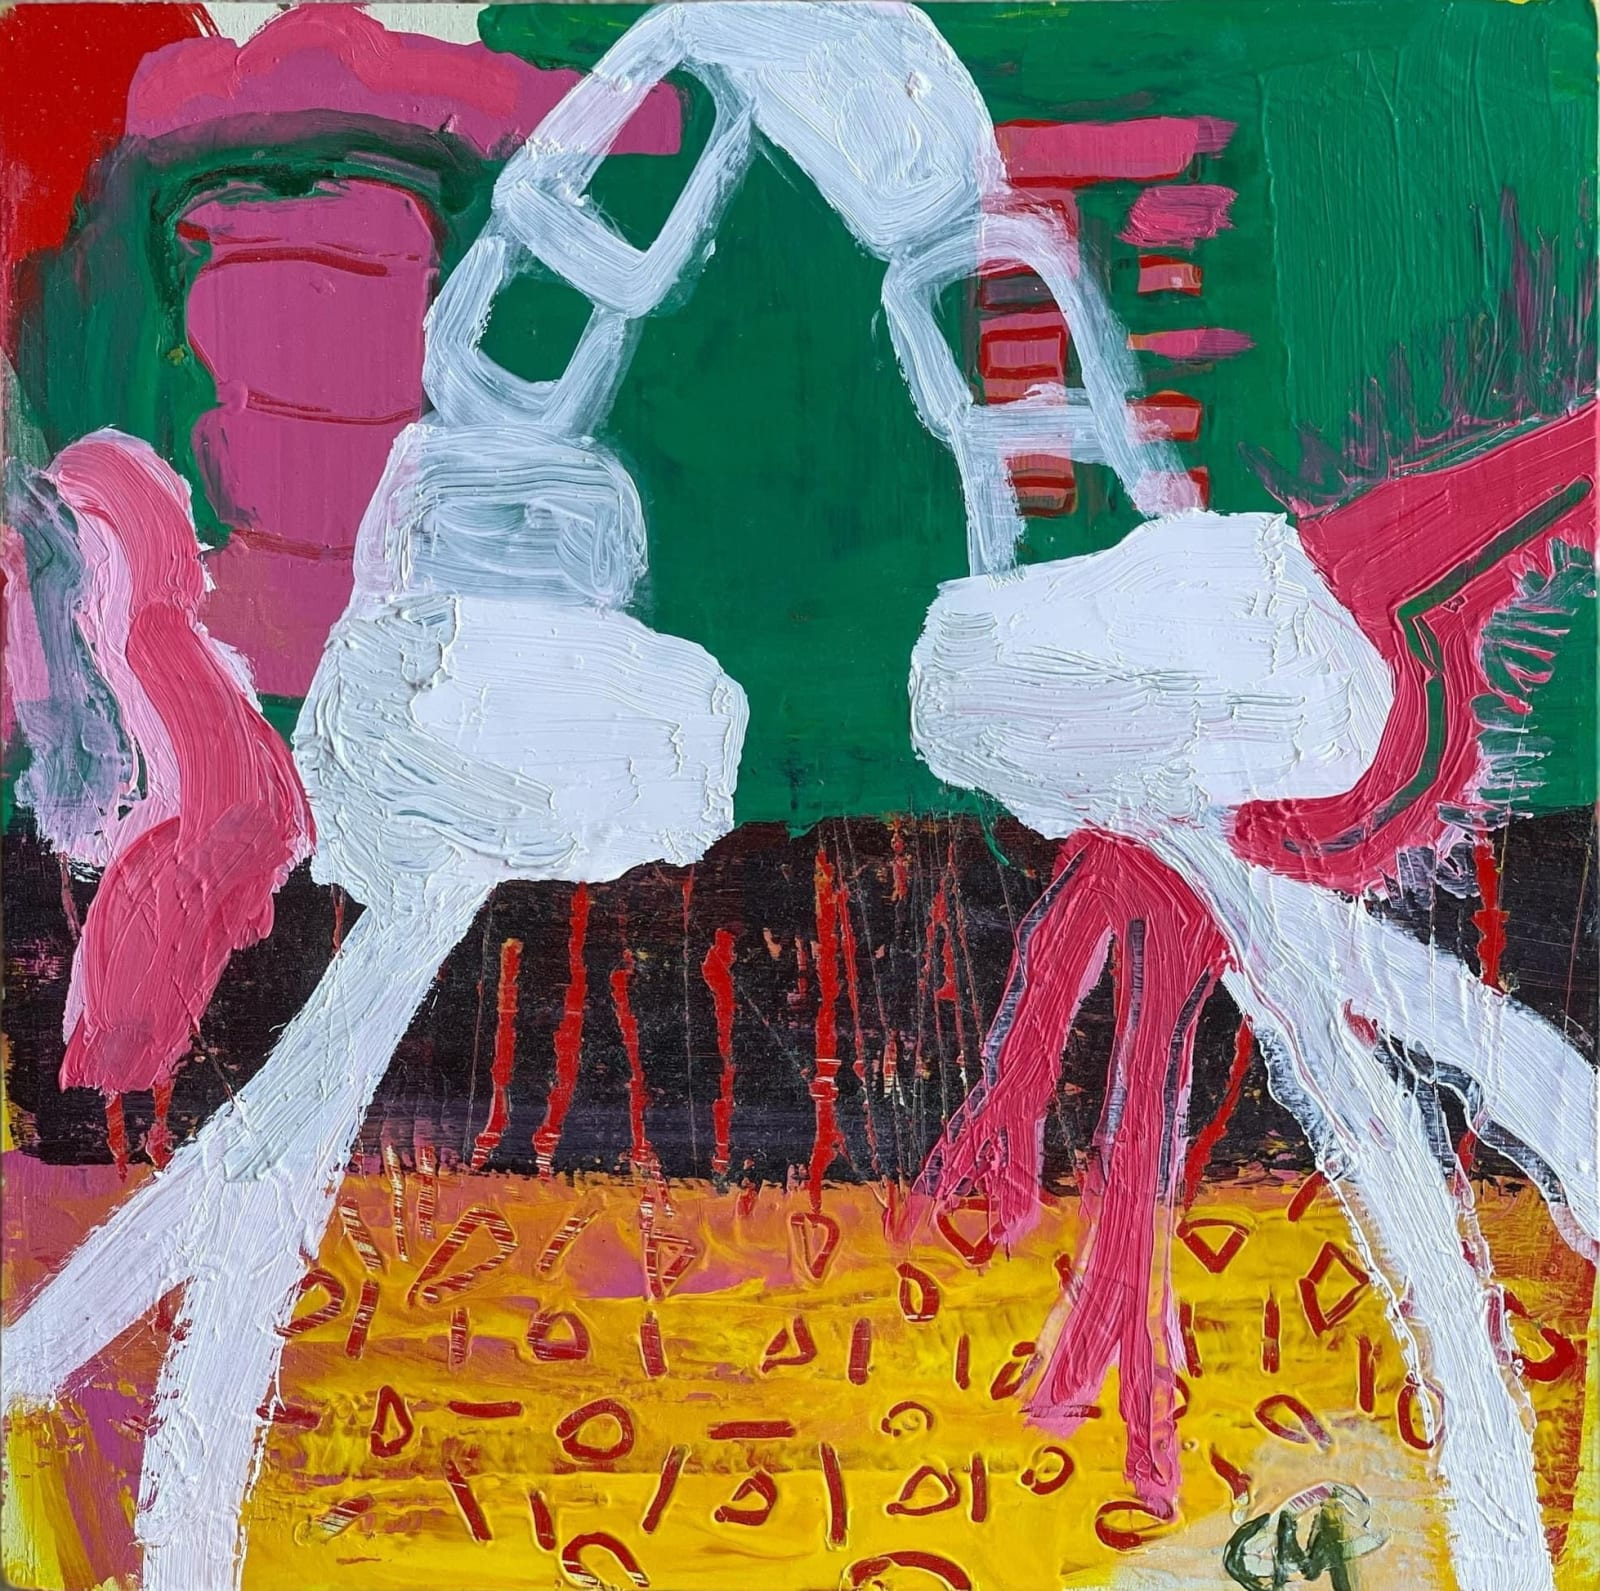 Cristina Muñiz Ode to Vessel, 2021 Oil on panel 8 x 8 in 20.3 x 20.3 cm